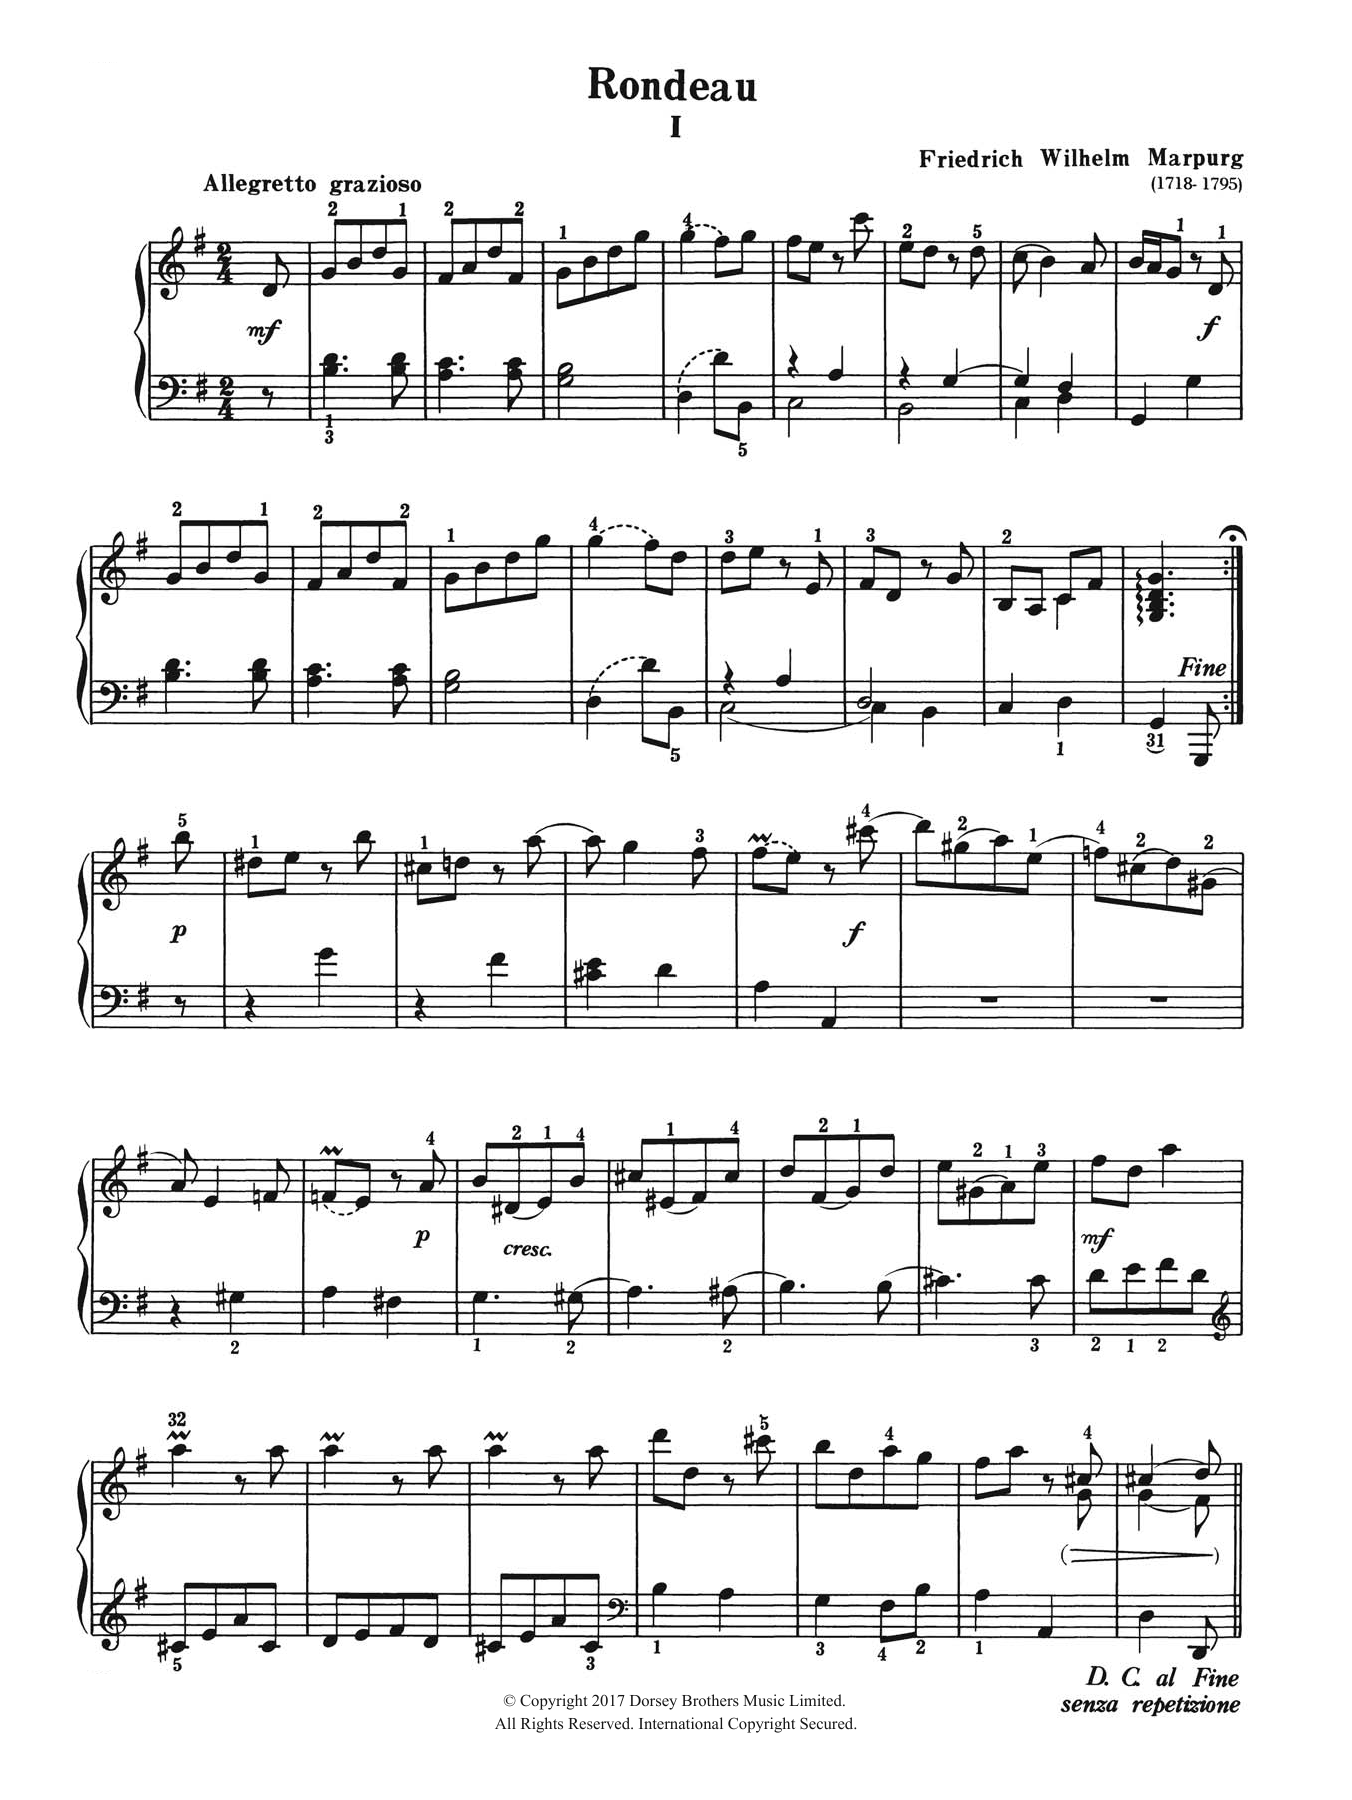 Rondeau Sheet Music